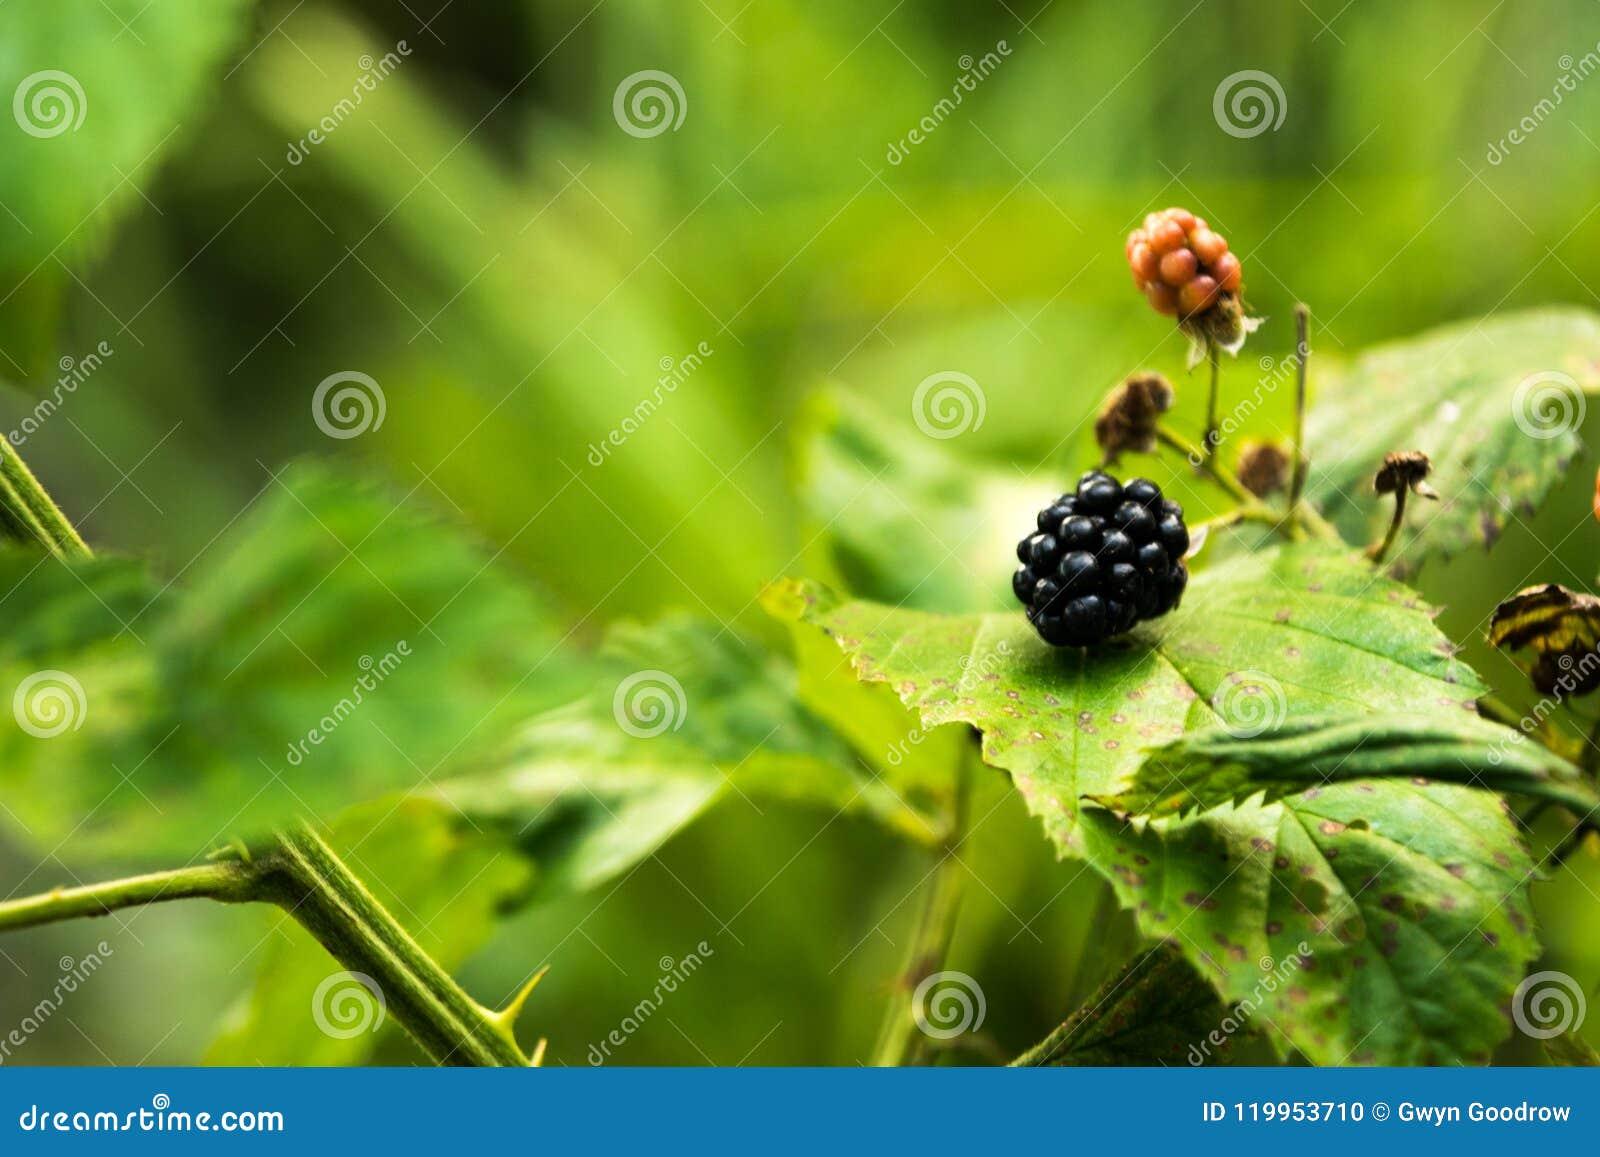 Blacberries στην άμπελο με το φυσικό φύλλωμα